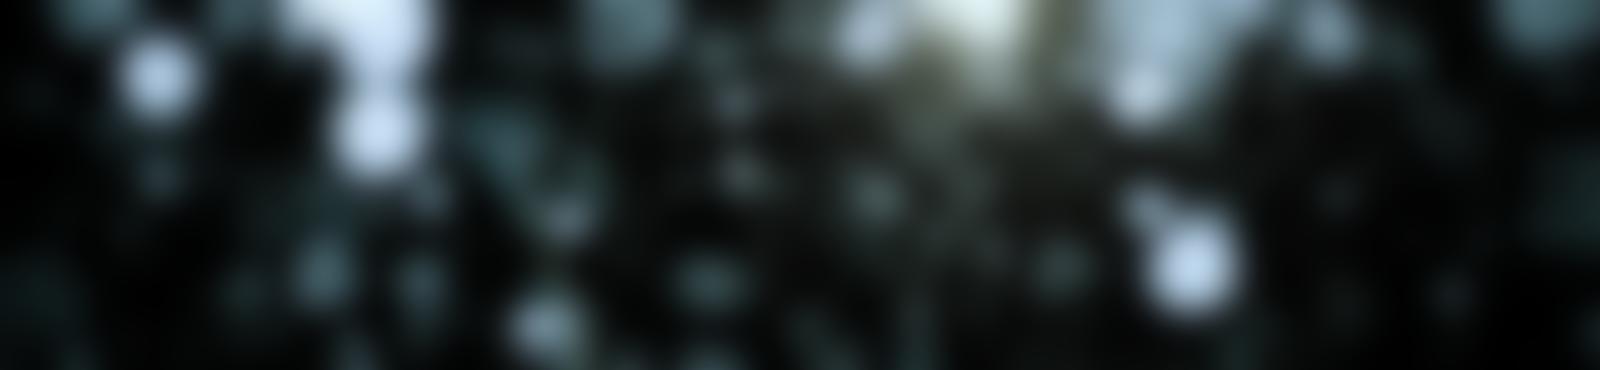 Blurred 1bc11ca3 3f5b 4efe bf81 ecc4979fdf7b